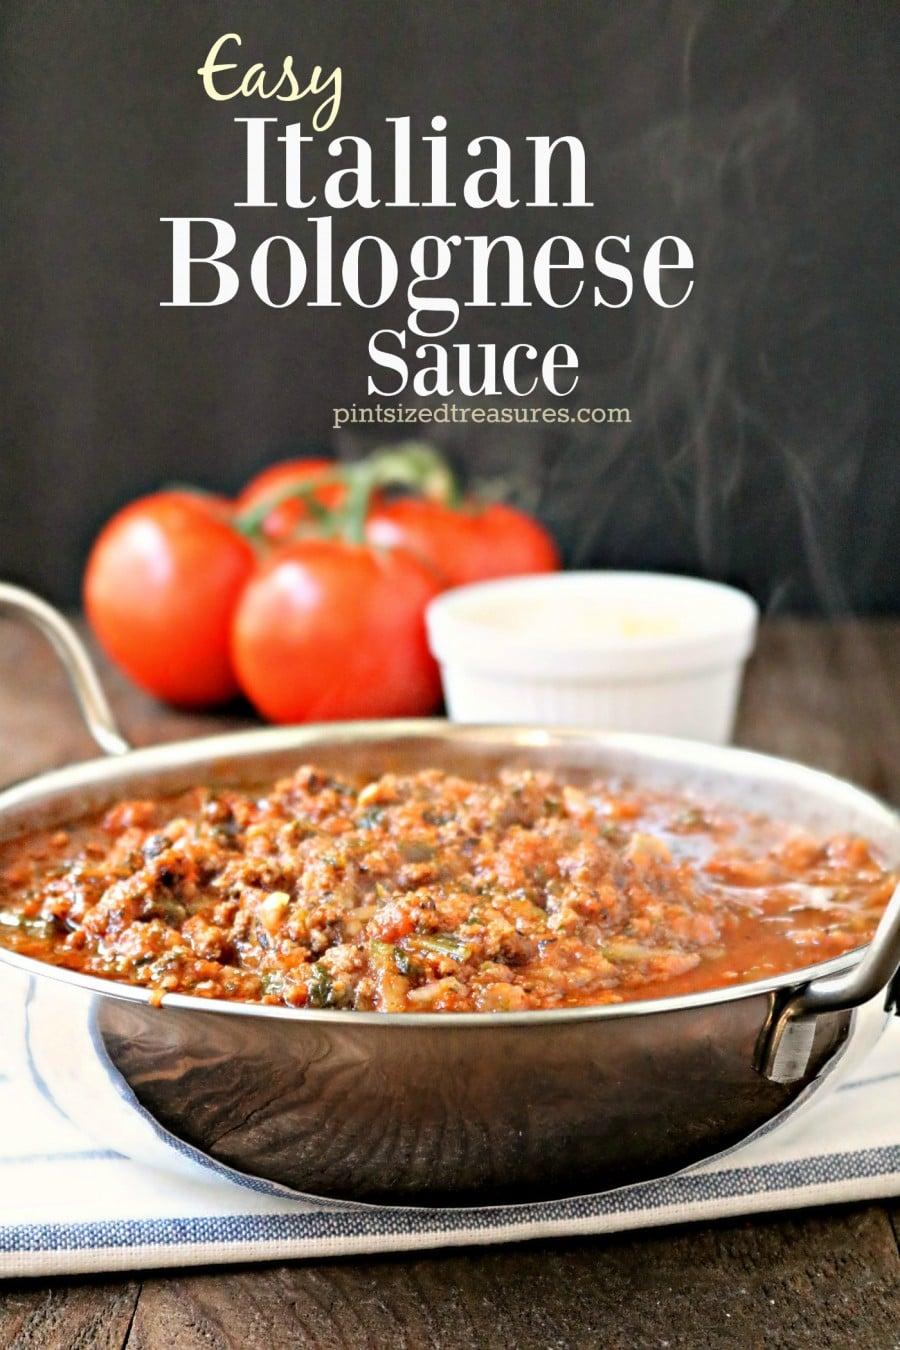 easy Italian bolognese sauce recipe